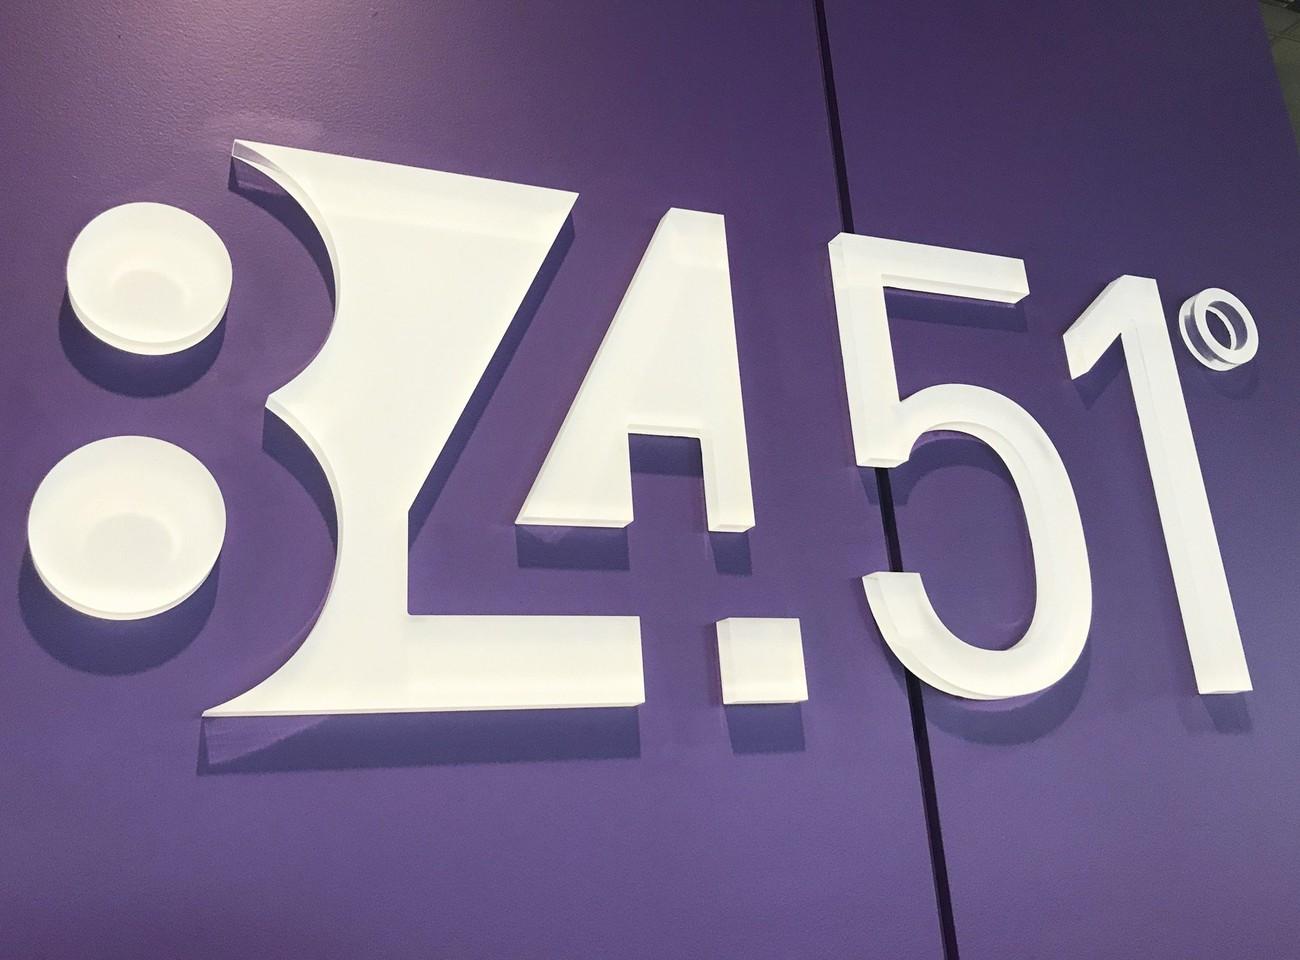 84.51° Careers